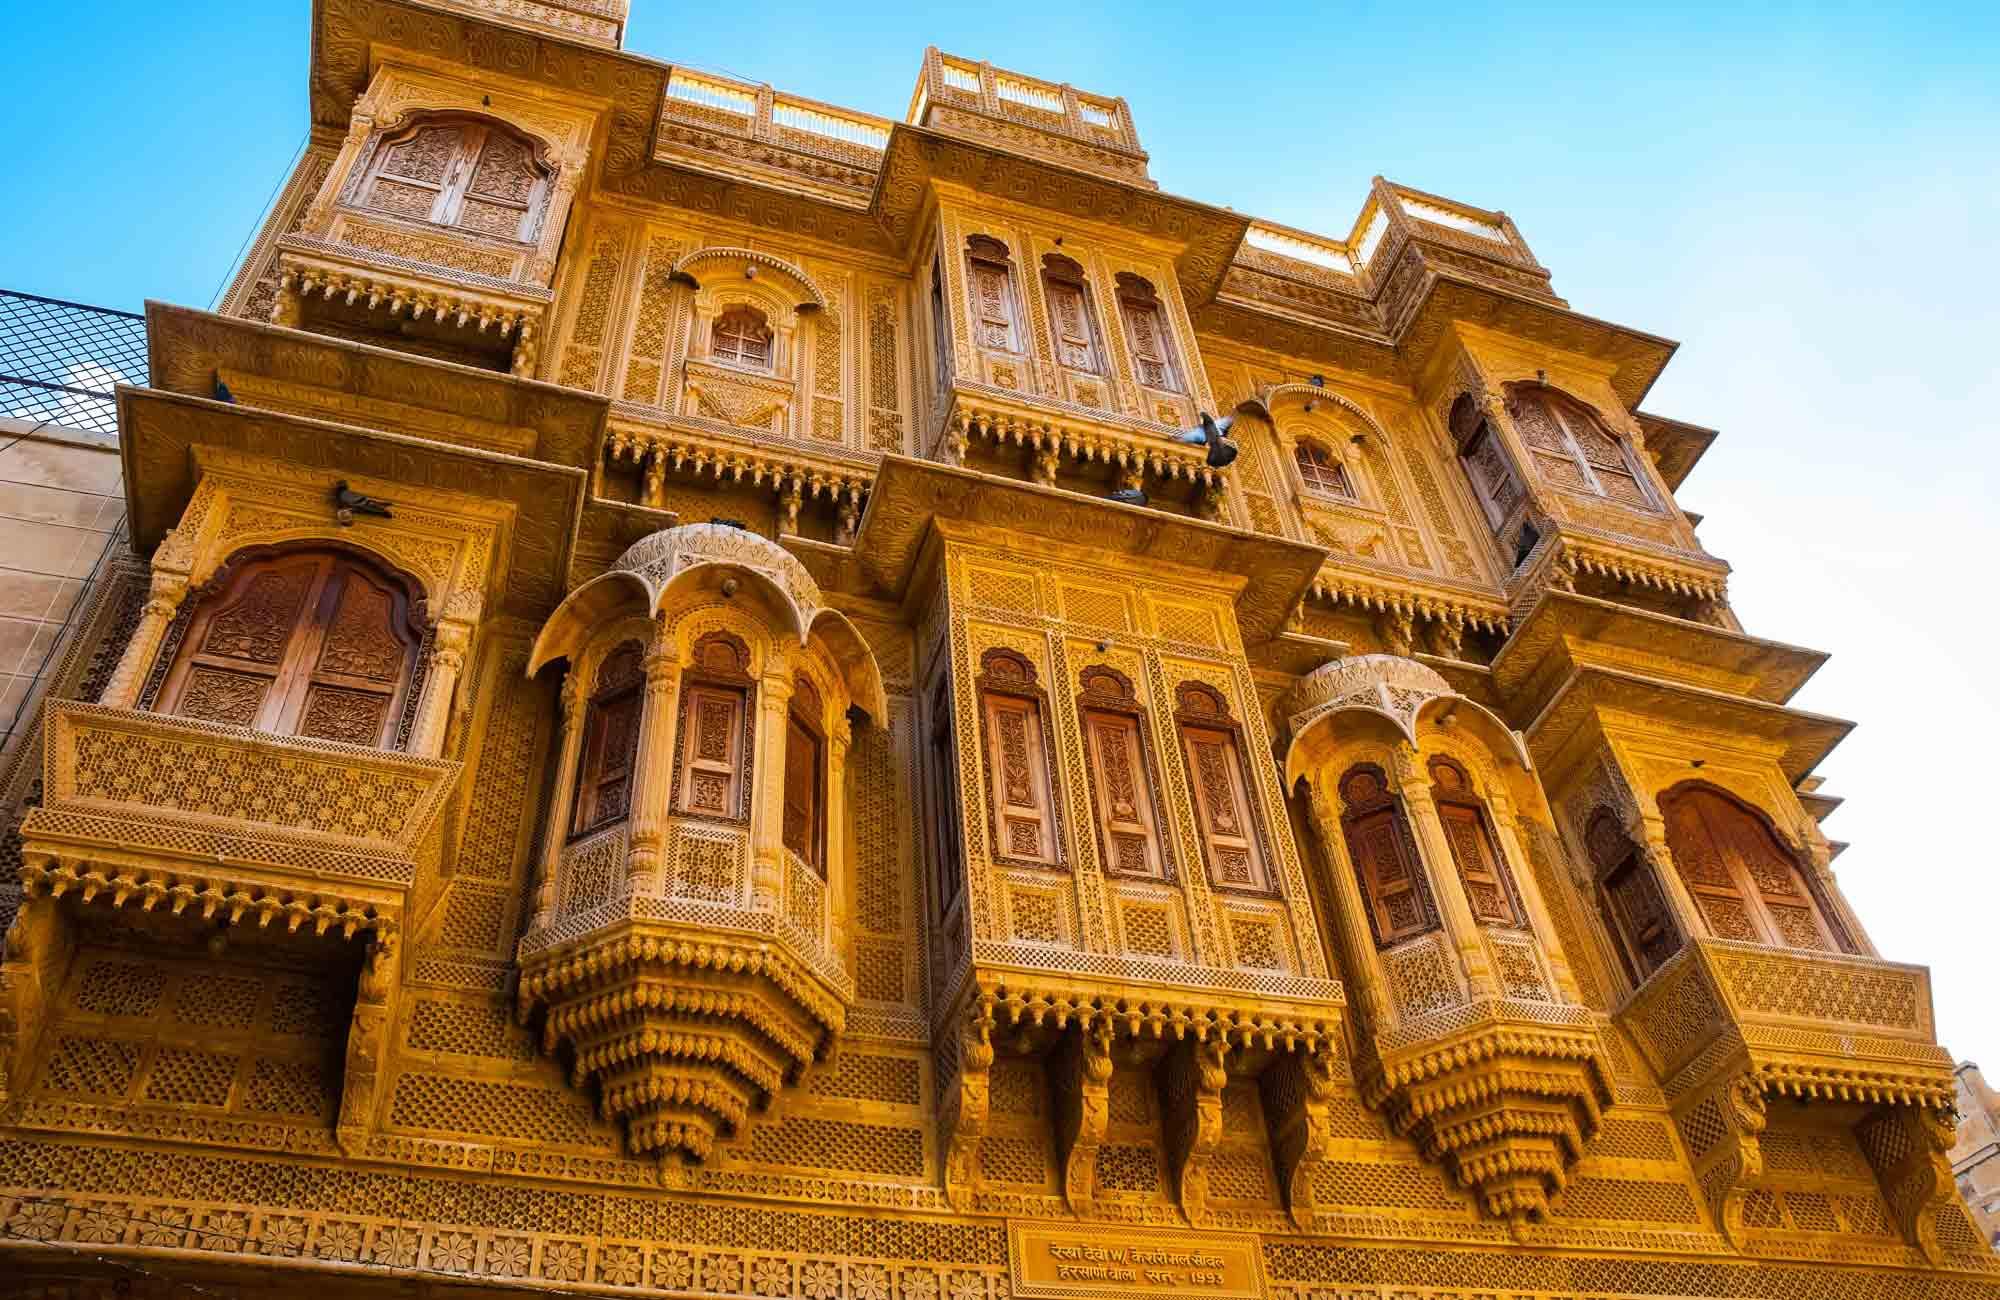 Voyage Inde - Jaisalmer Patwon ki Haveli palace - Amplitudes